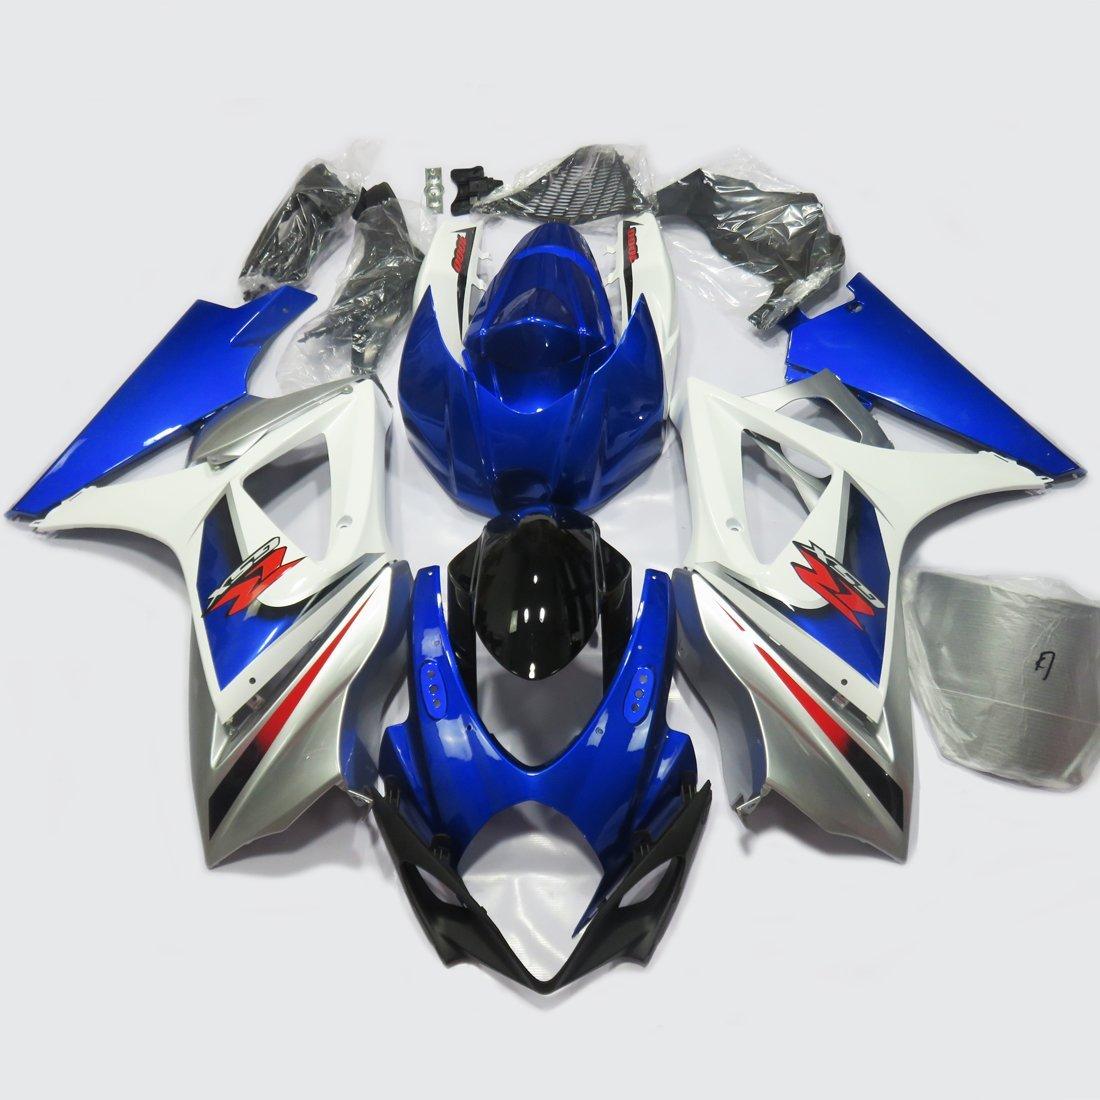 Full Fairing Set Kit For Suzuki K7 GSXR 1000 GSXR1000 2007 2008 GSX-R1000 K7 07 08 Injection Molding Fairings UV Blue Painted